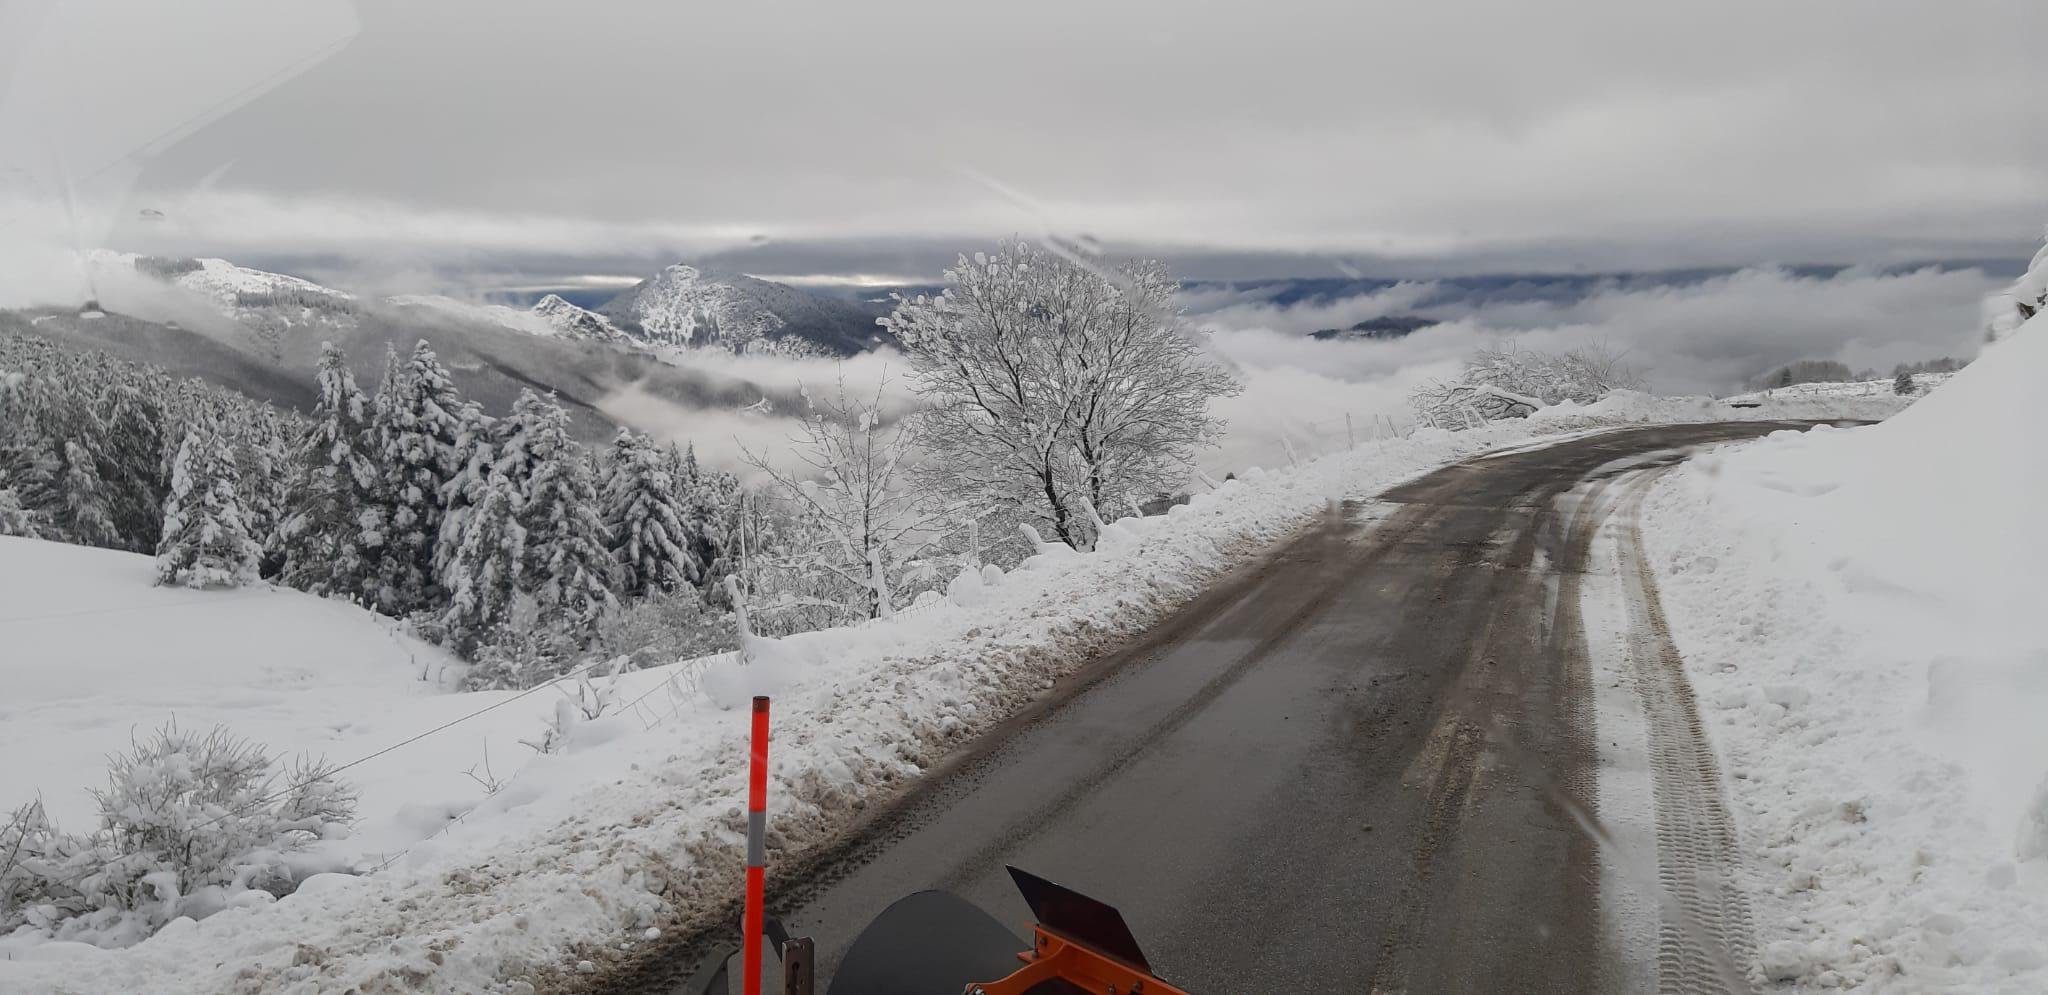 Val di Vara: emergenza neve